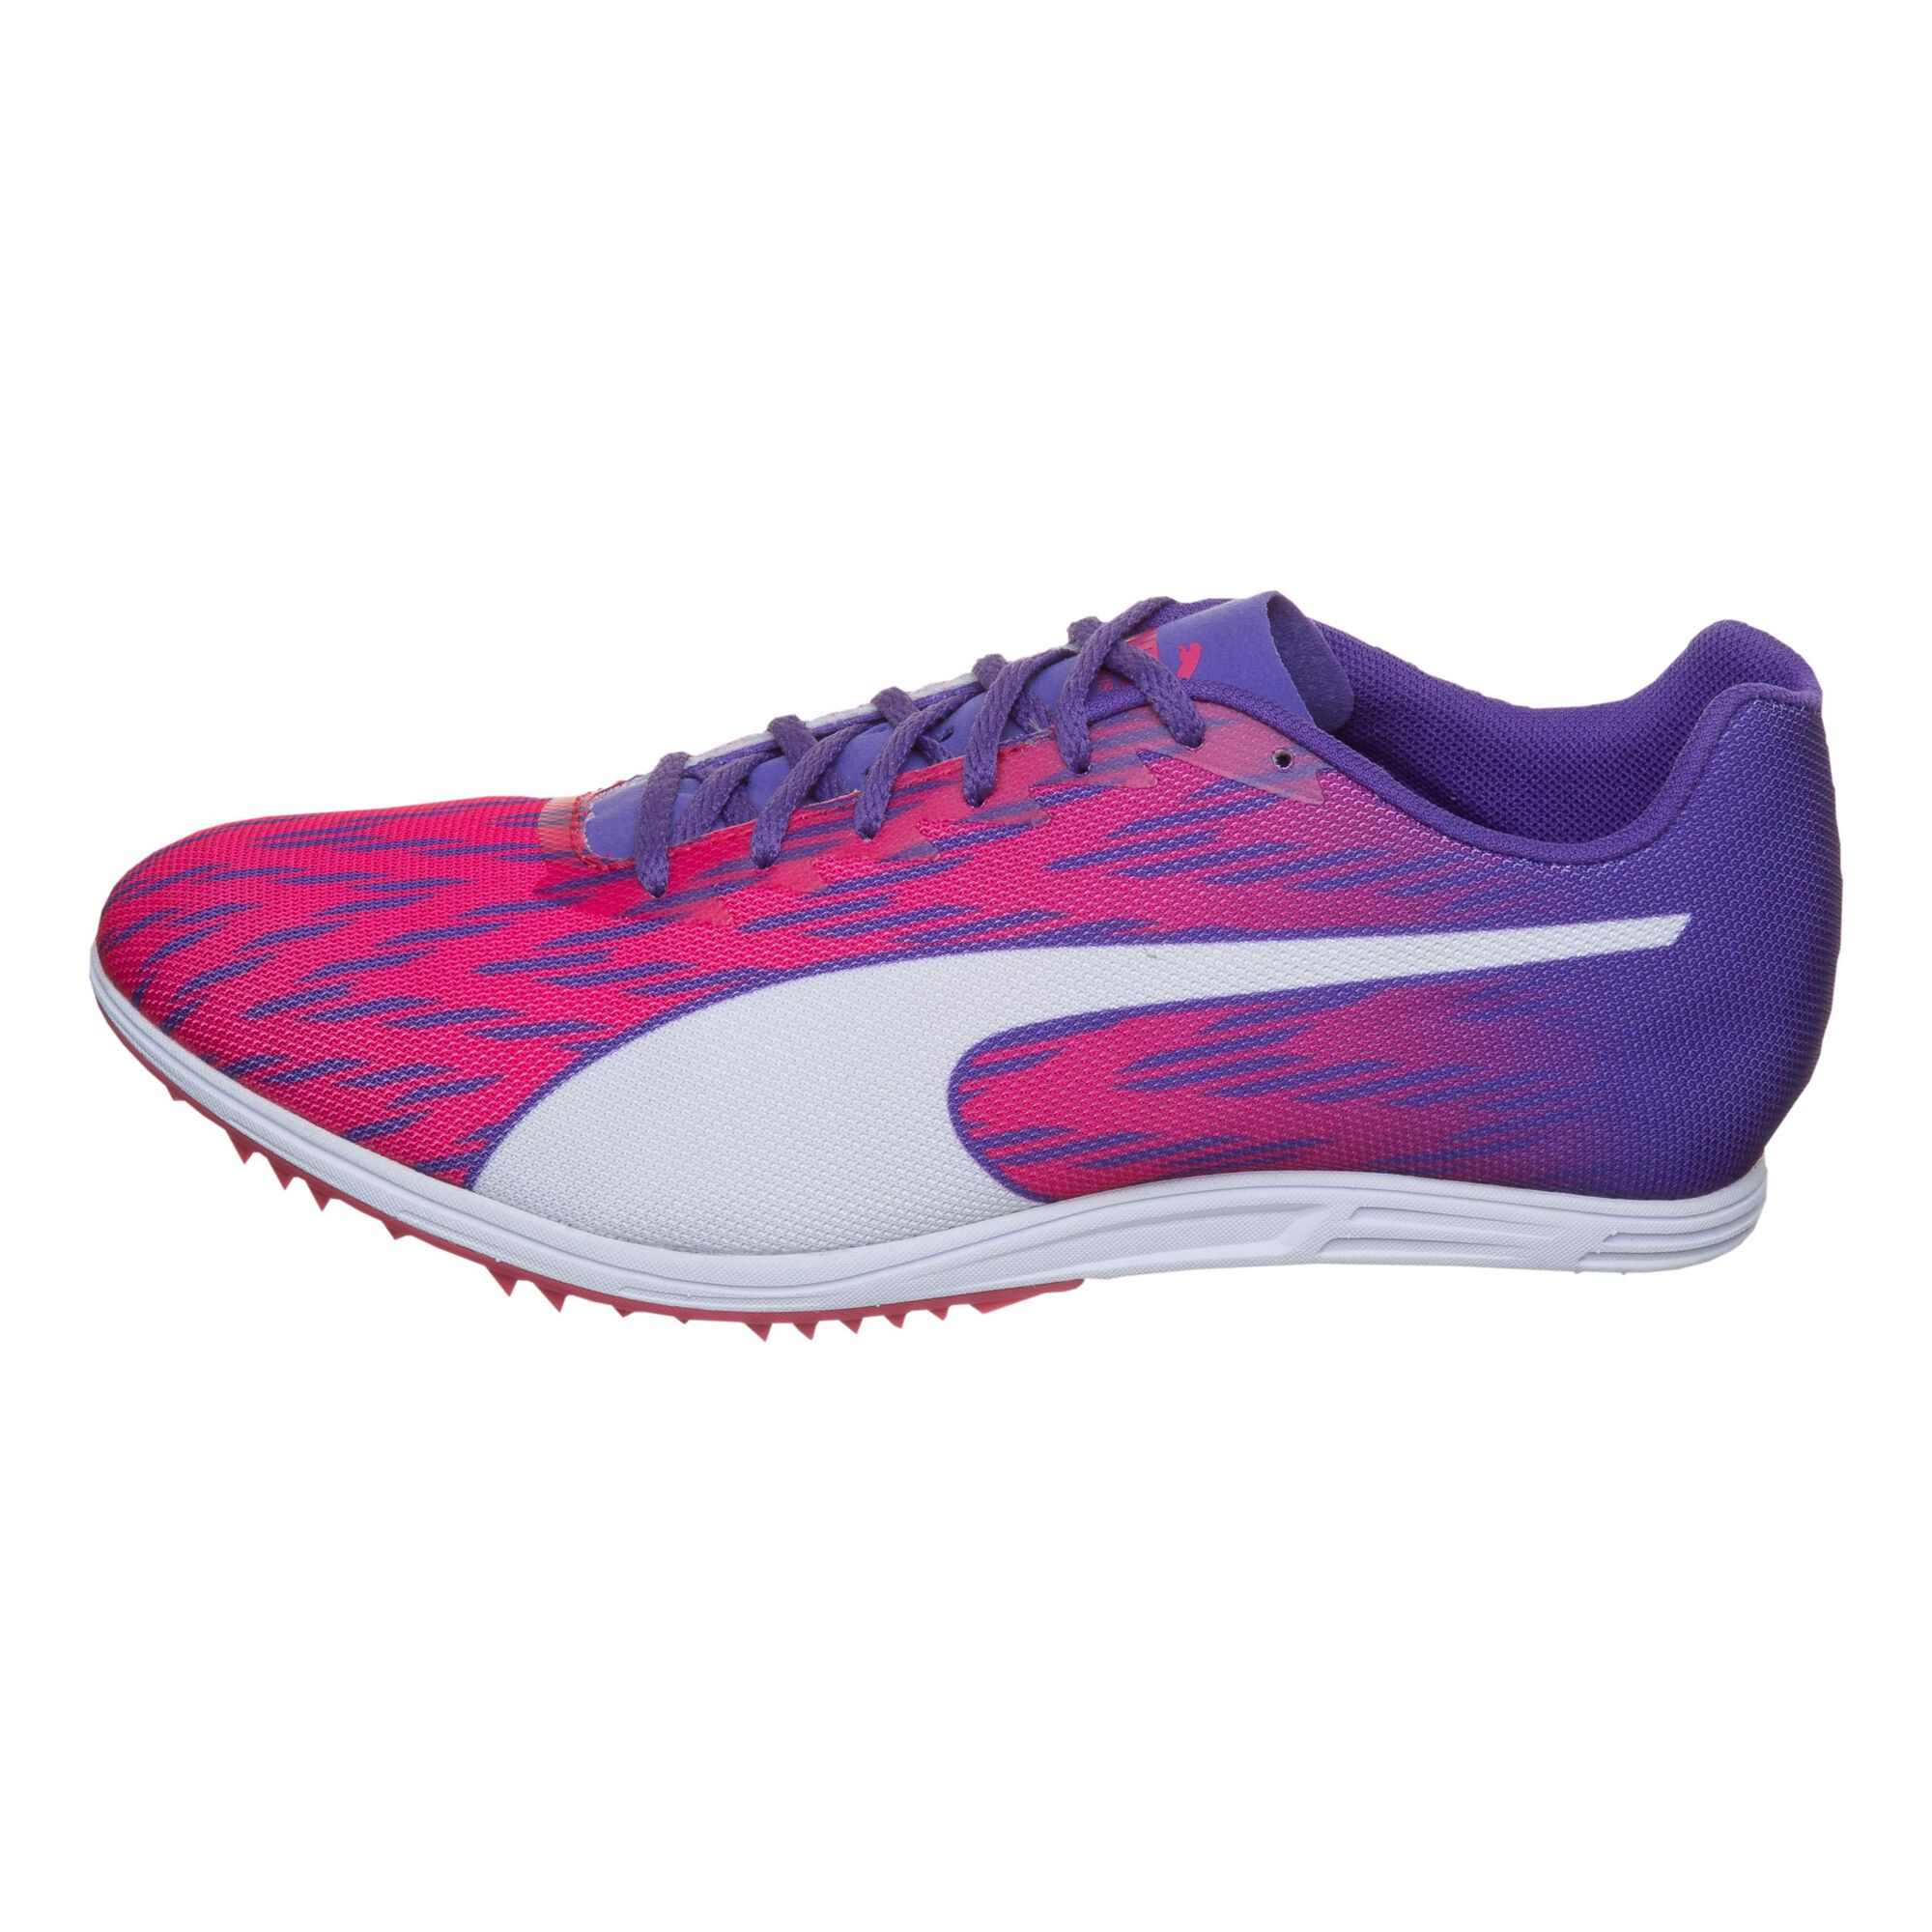 buy Puma EvoSPEED Distance 7 Spike Shoes Women - Pink b06befc7f